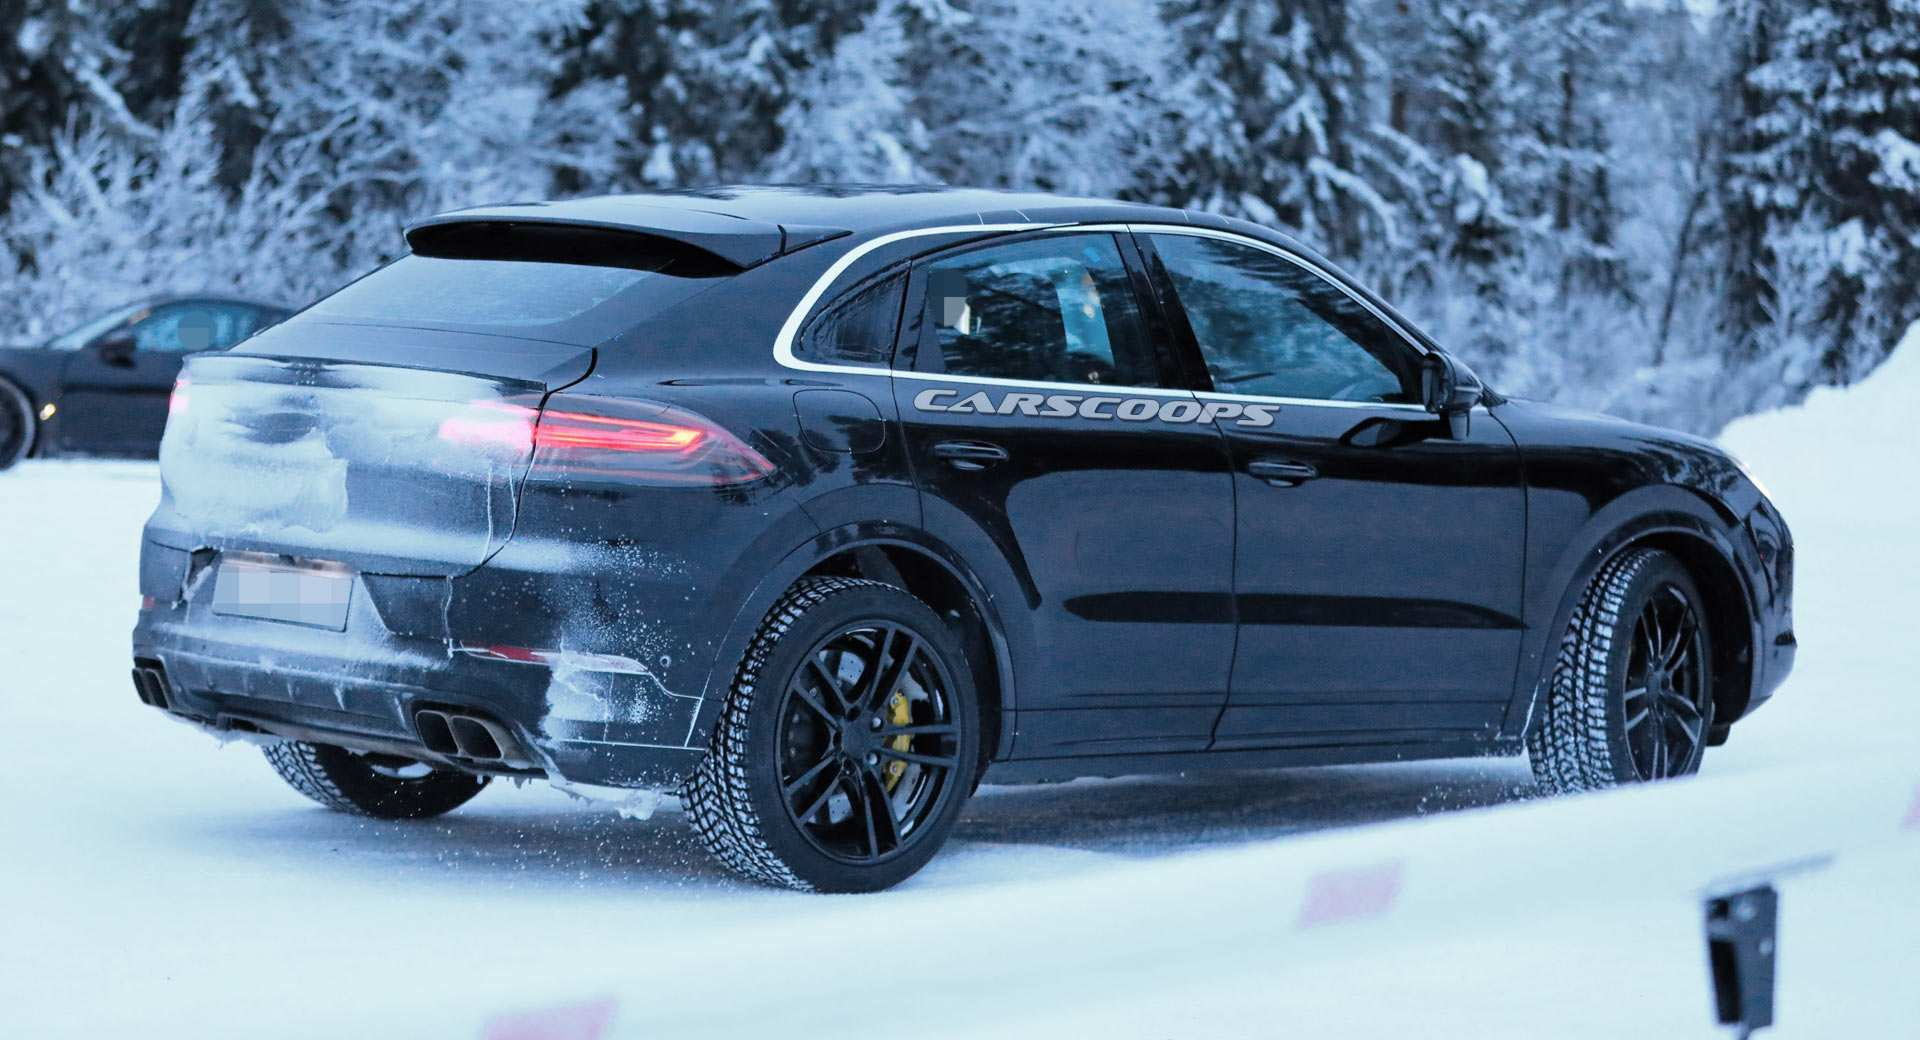 93 New 2020 Porsche Suv Reviews with 2020 Porsche Suv